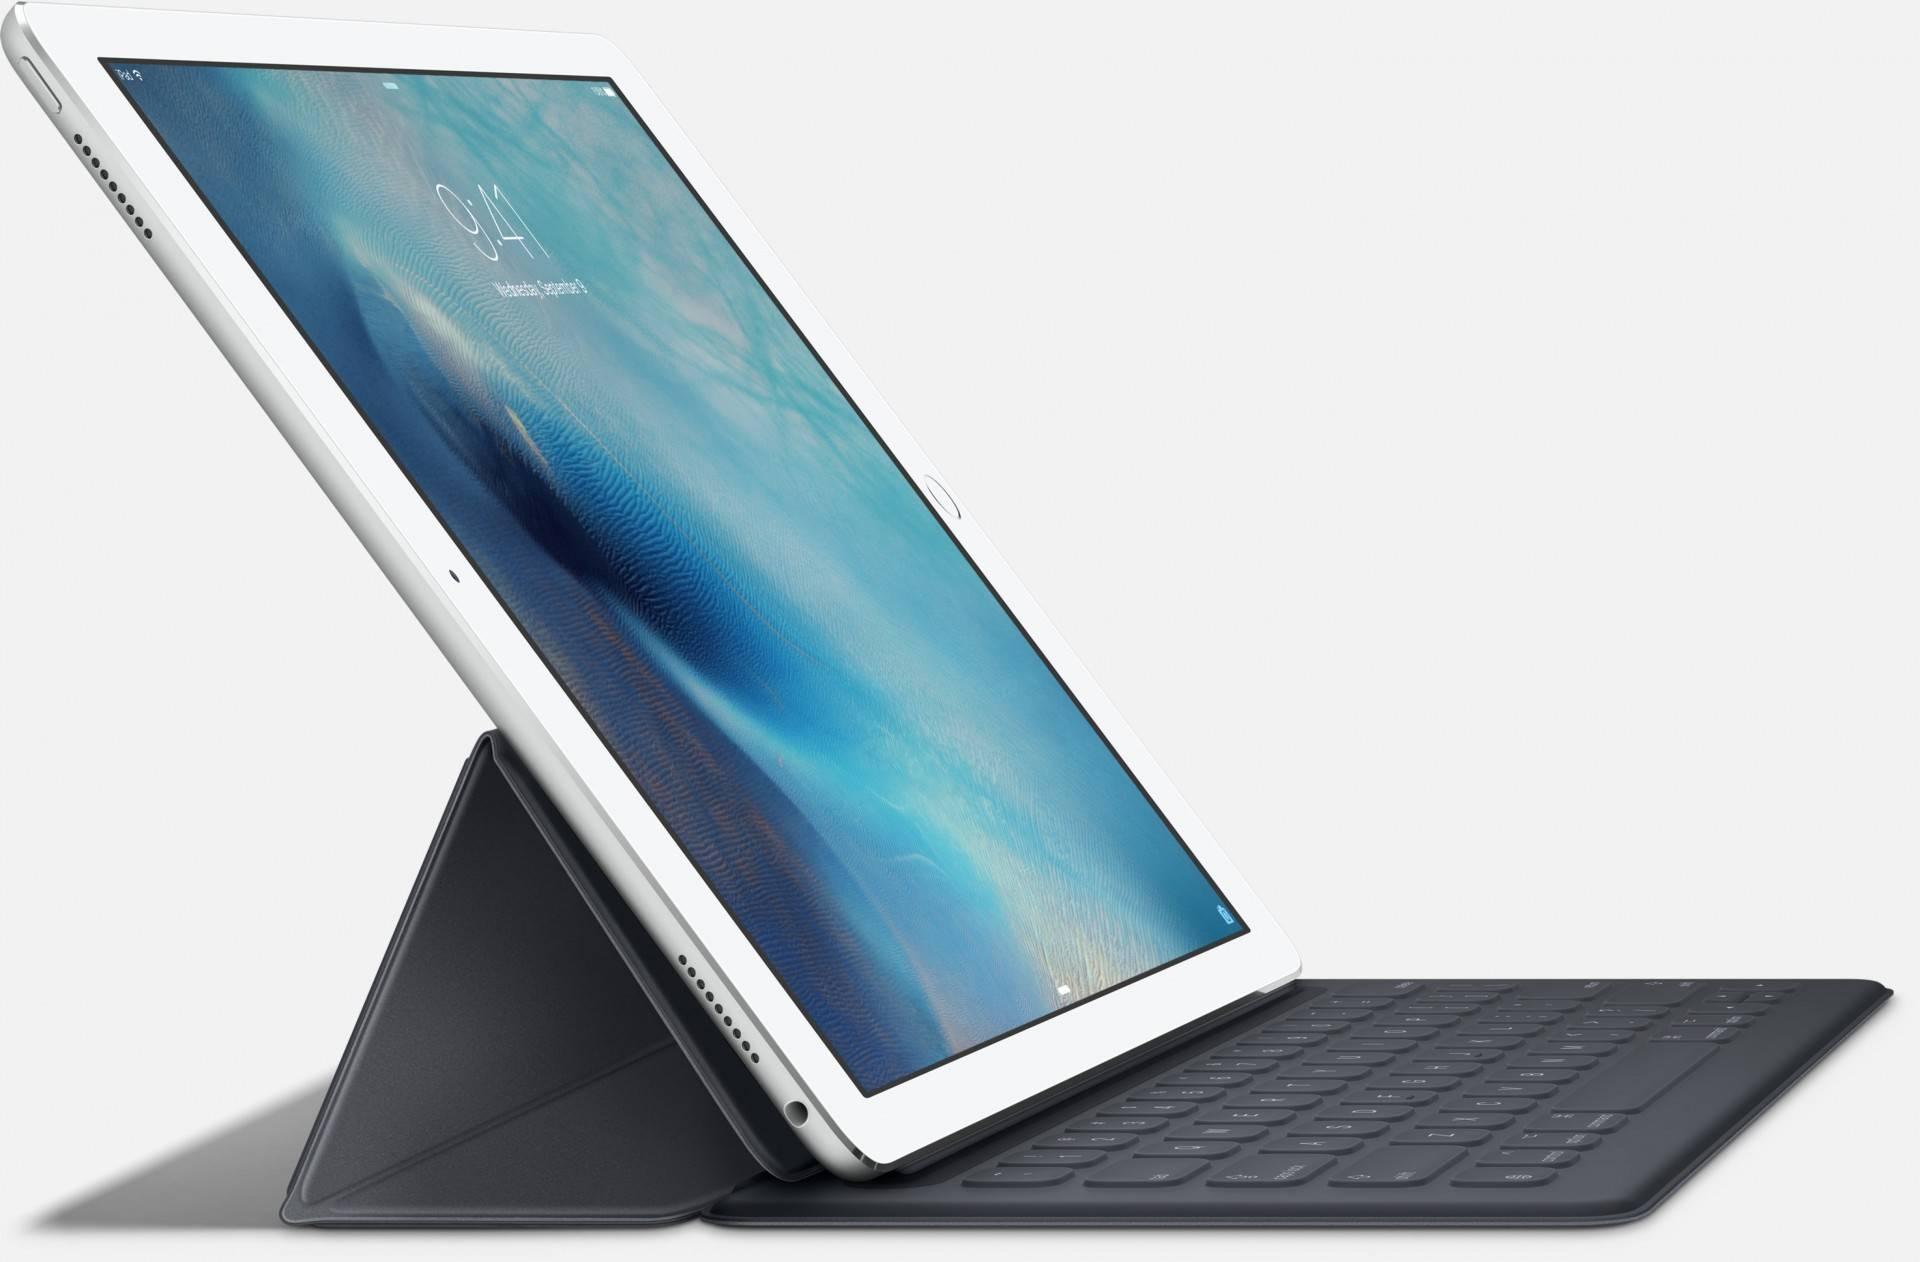 iPad Pro,采用 iOS 作为操作系统,支持分屏多任务同时处理